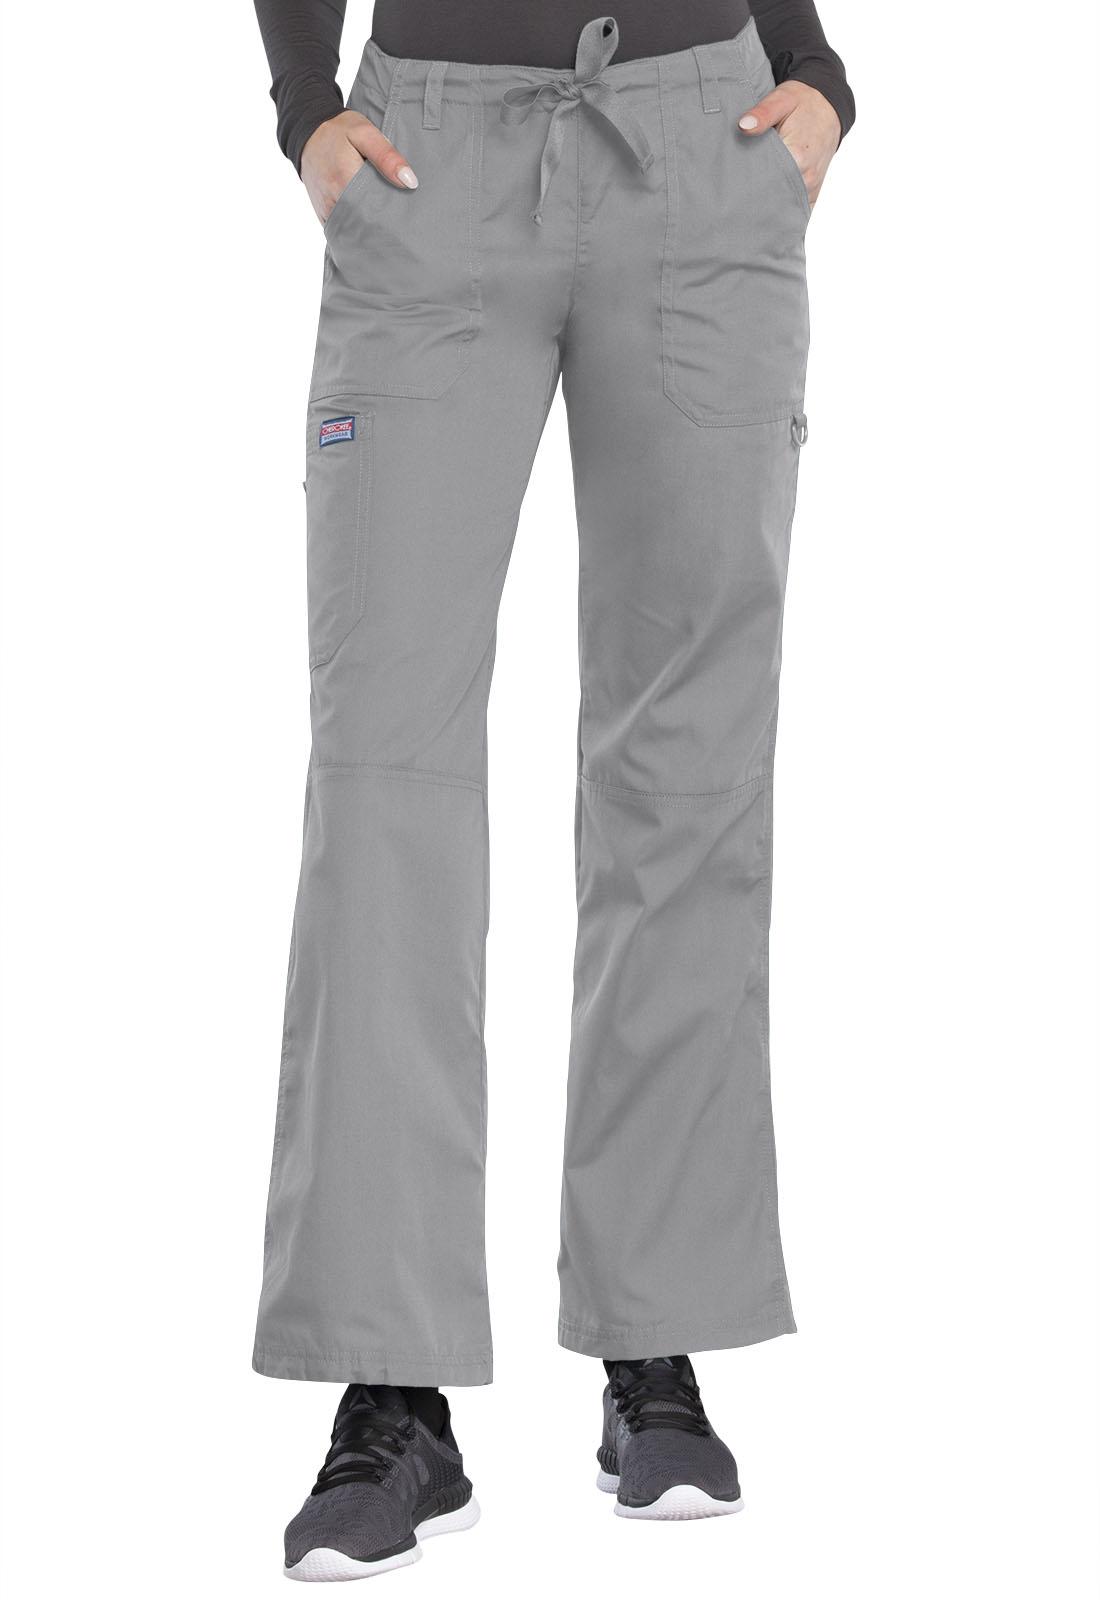 d0300d1ead8 Cherokee Workwear. WW Originals Low Rise Drawstring Cargo Pant in Grey  (Petite)